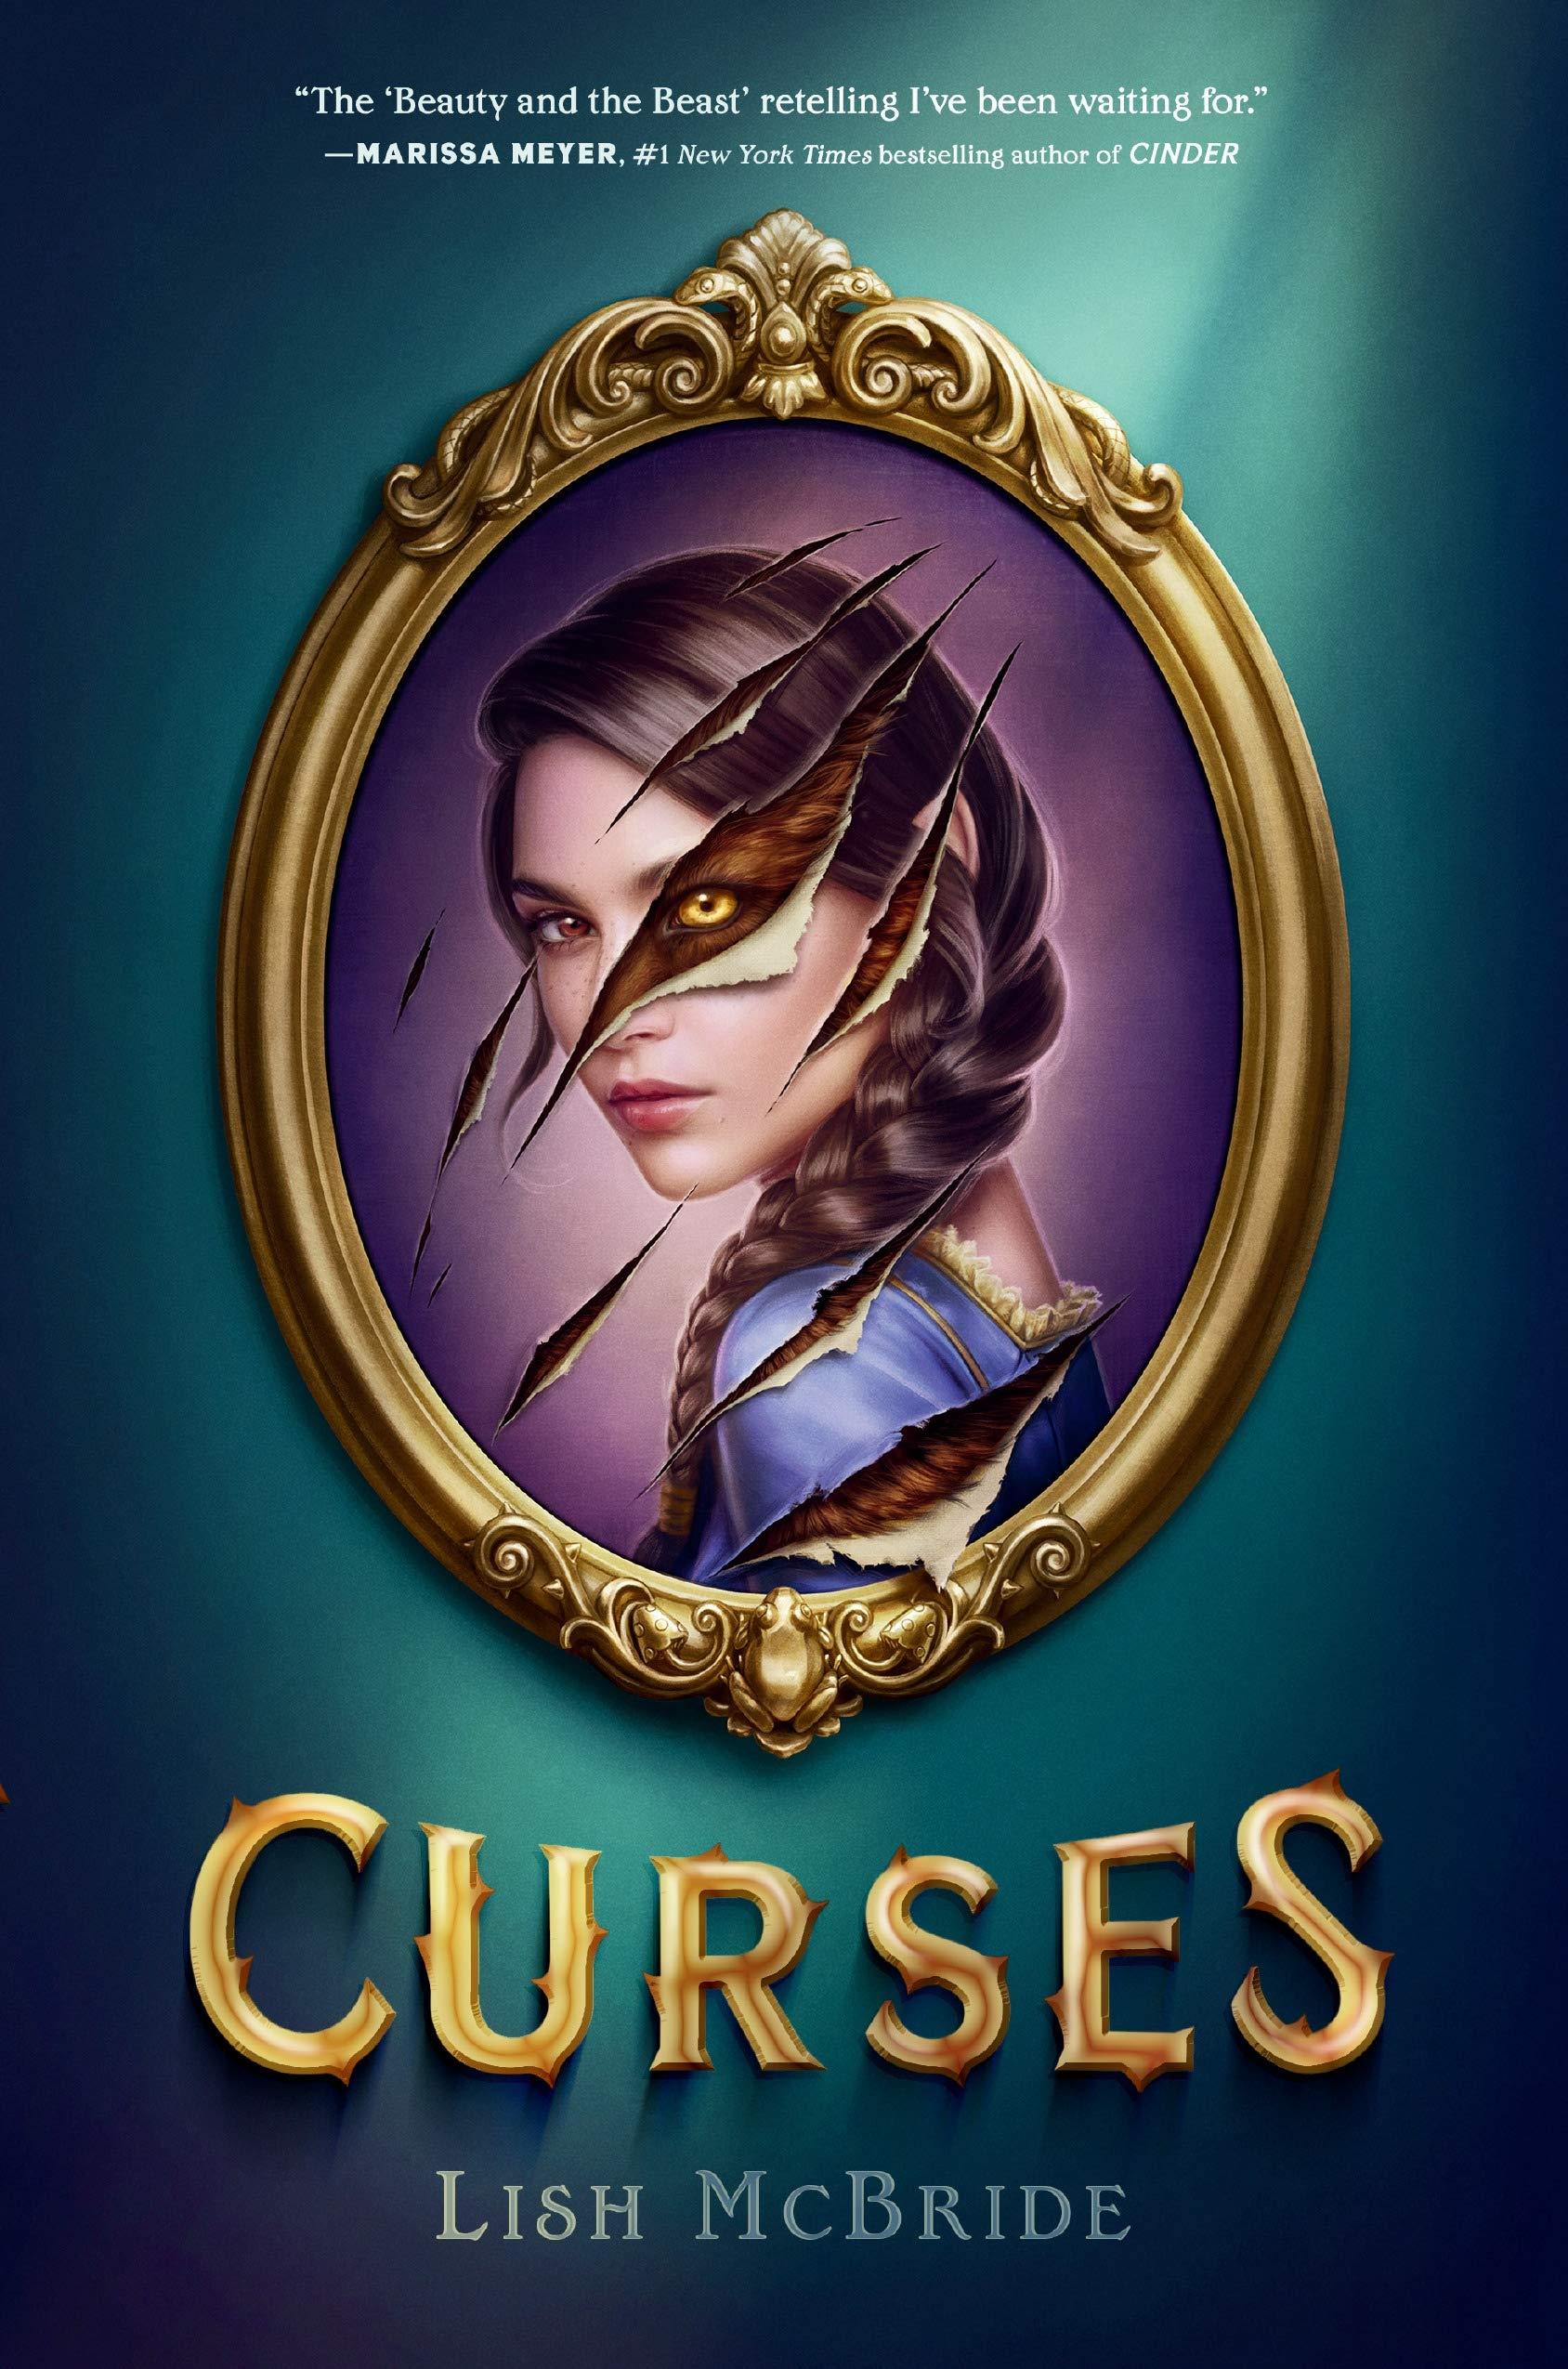 Amazon.com: Curses: 9781984815590: McBride, Lish: Books